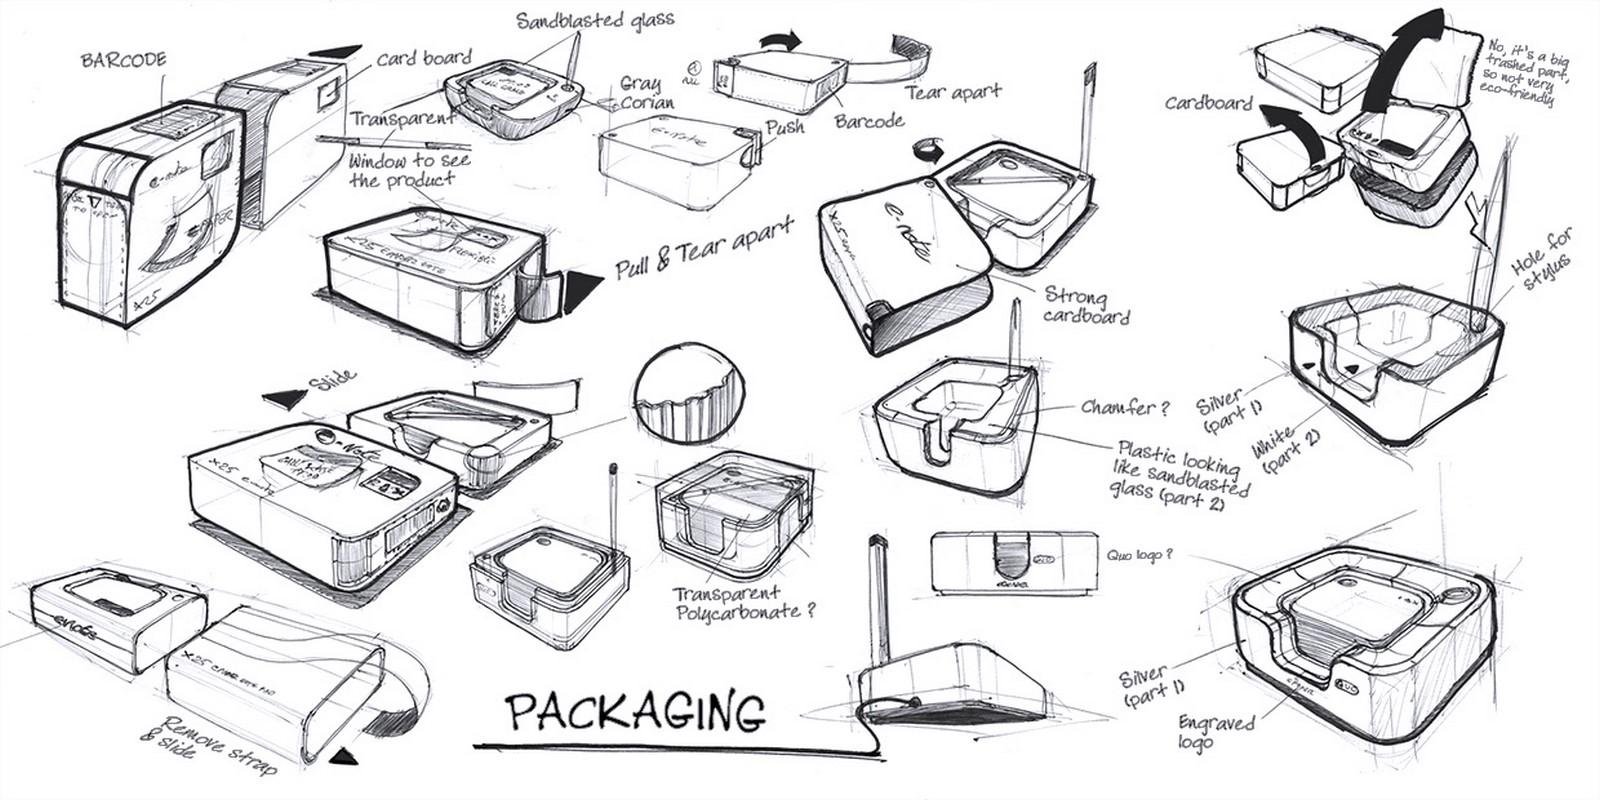 Sequoia-studio- 10 Iconic Products - Sheet7